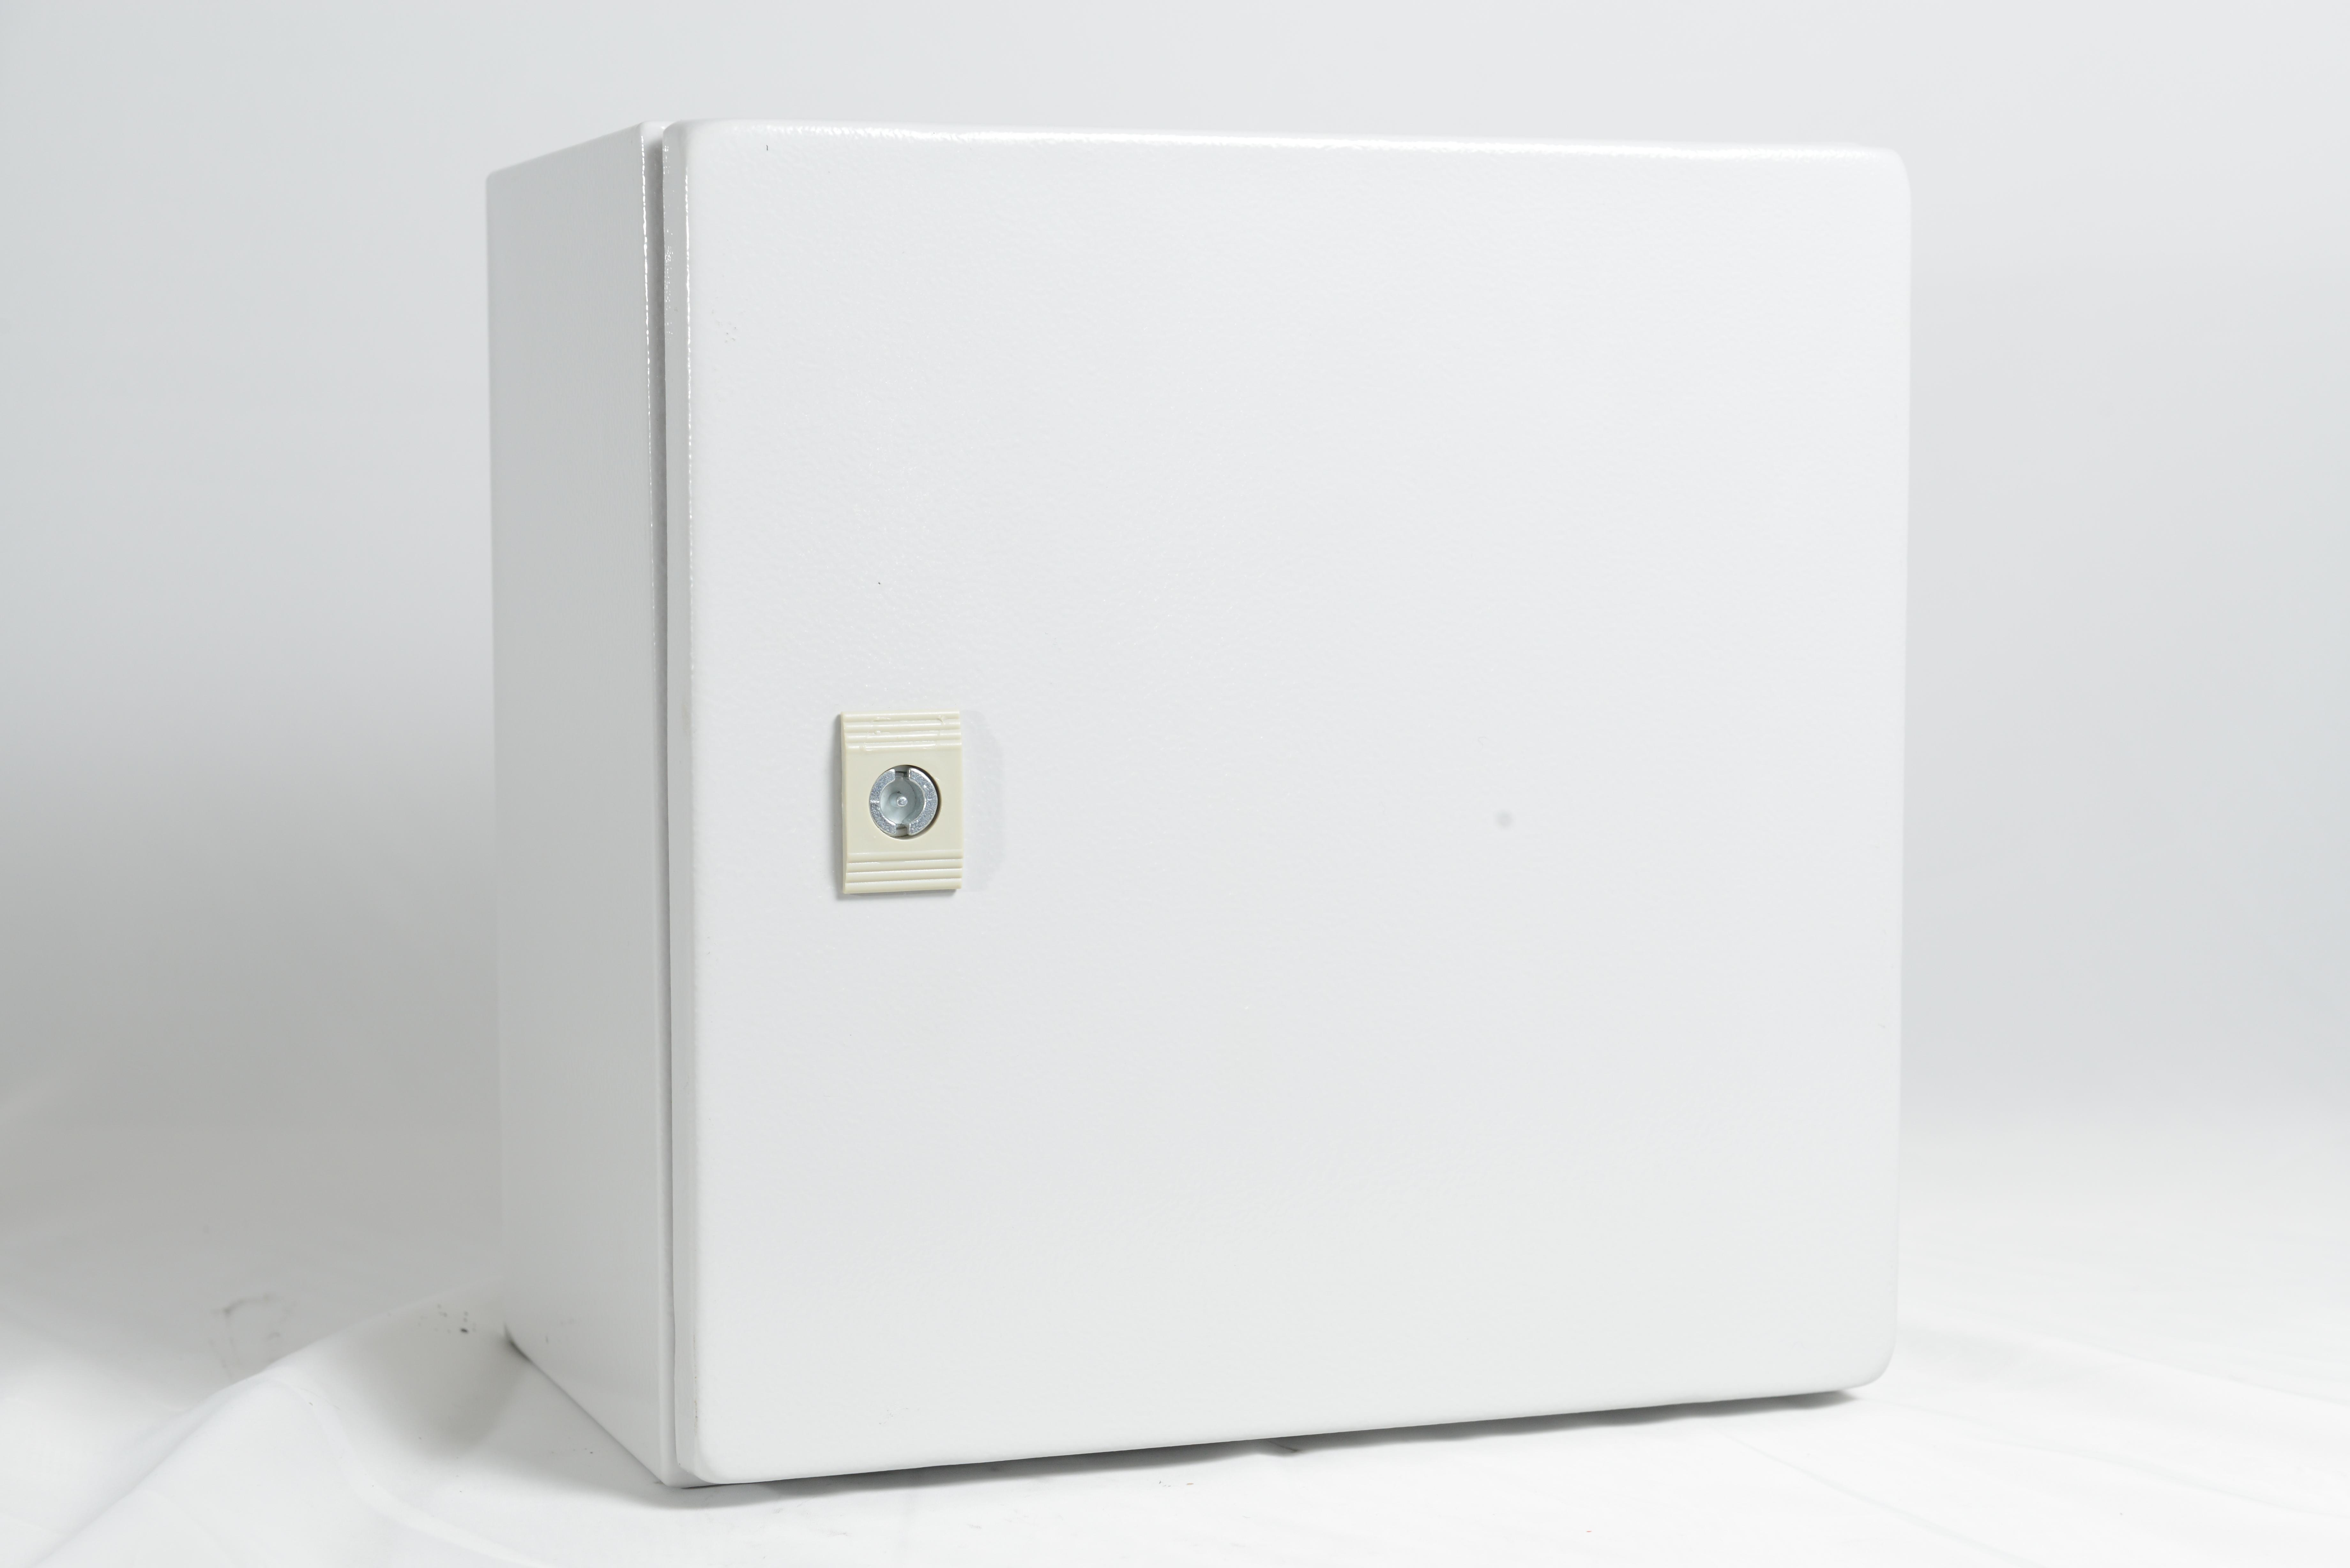 RCG Metal Enclosure 600x600x300mm - Wall mounting